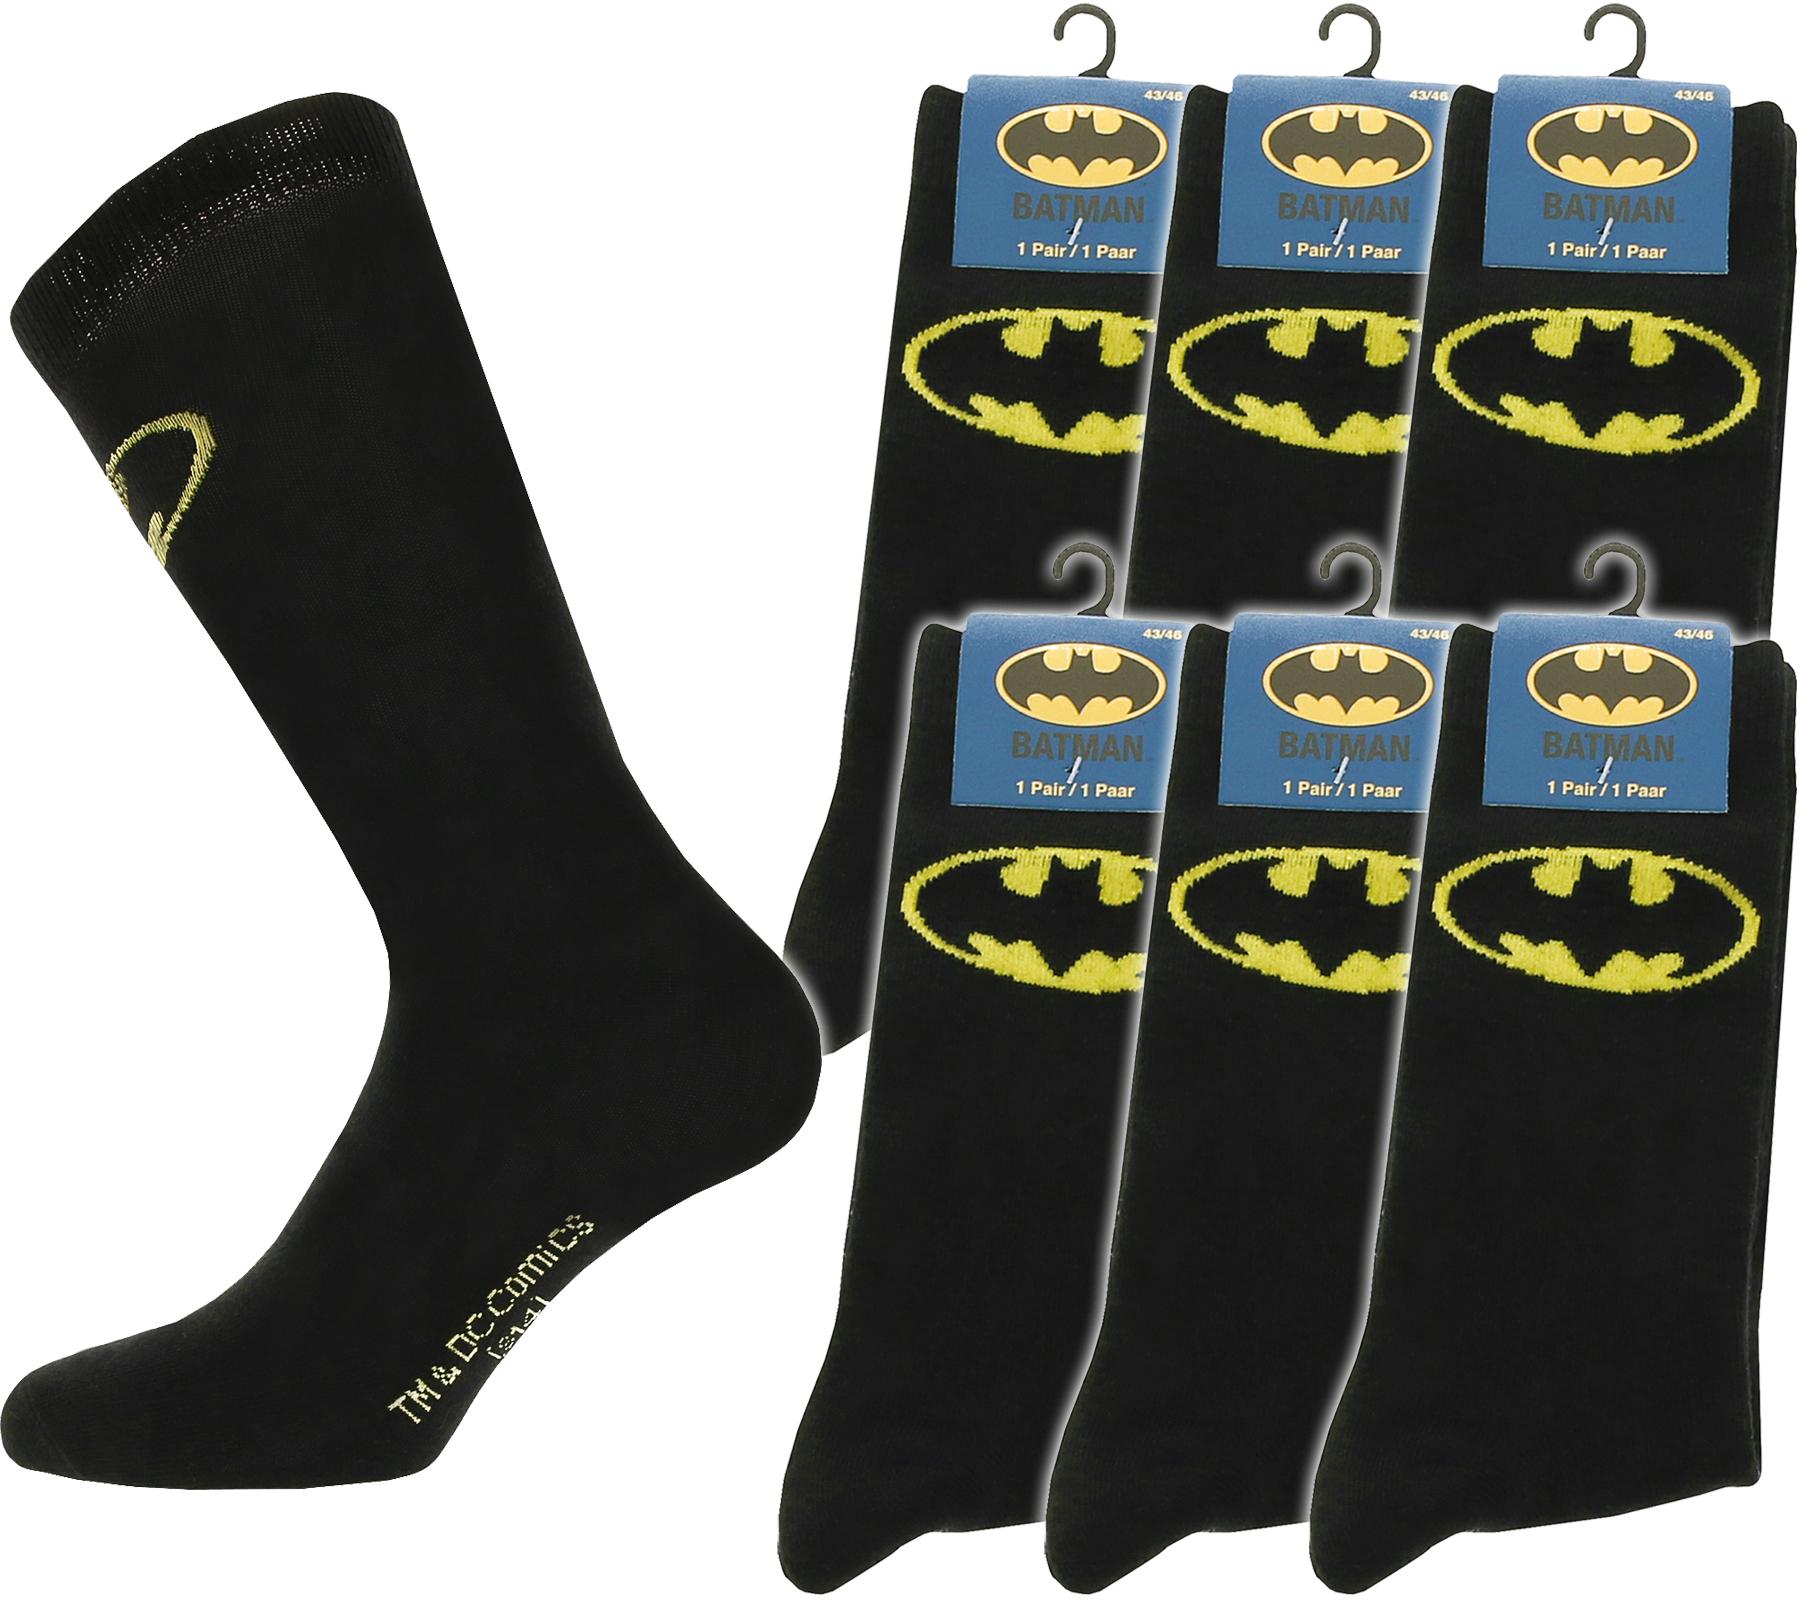 6 Paar Batman Socken in Schwarz mit Logo, Gr. 39 - 42 + 43 - 46